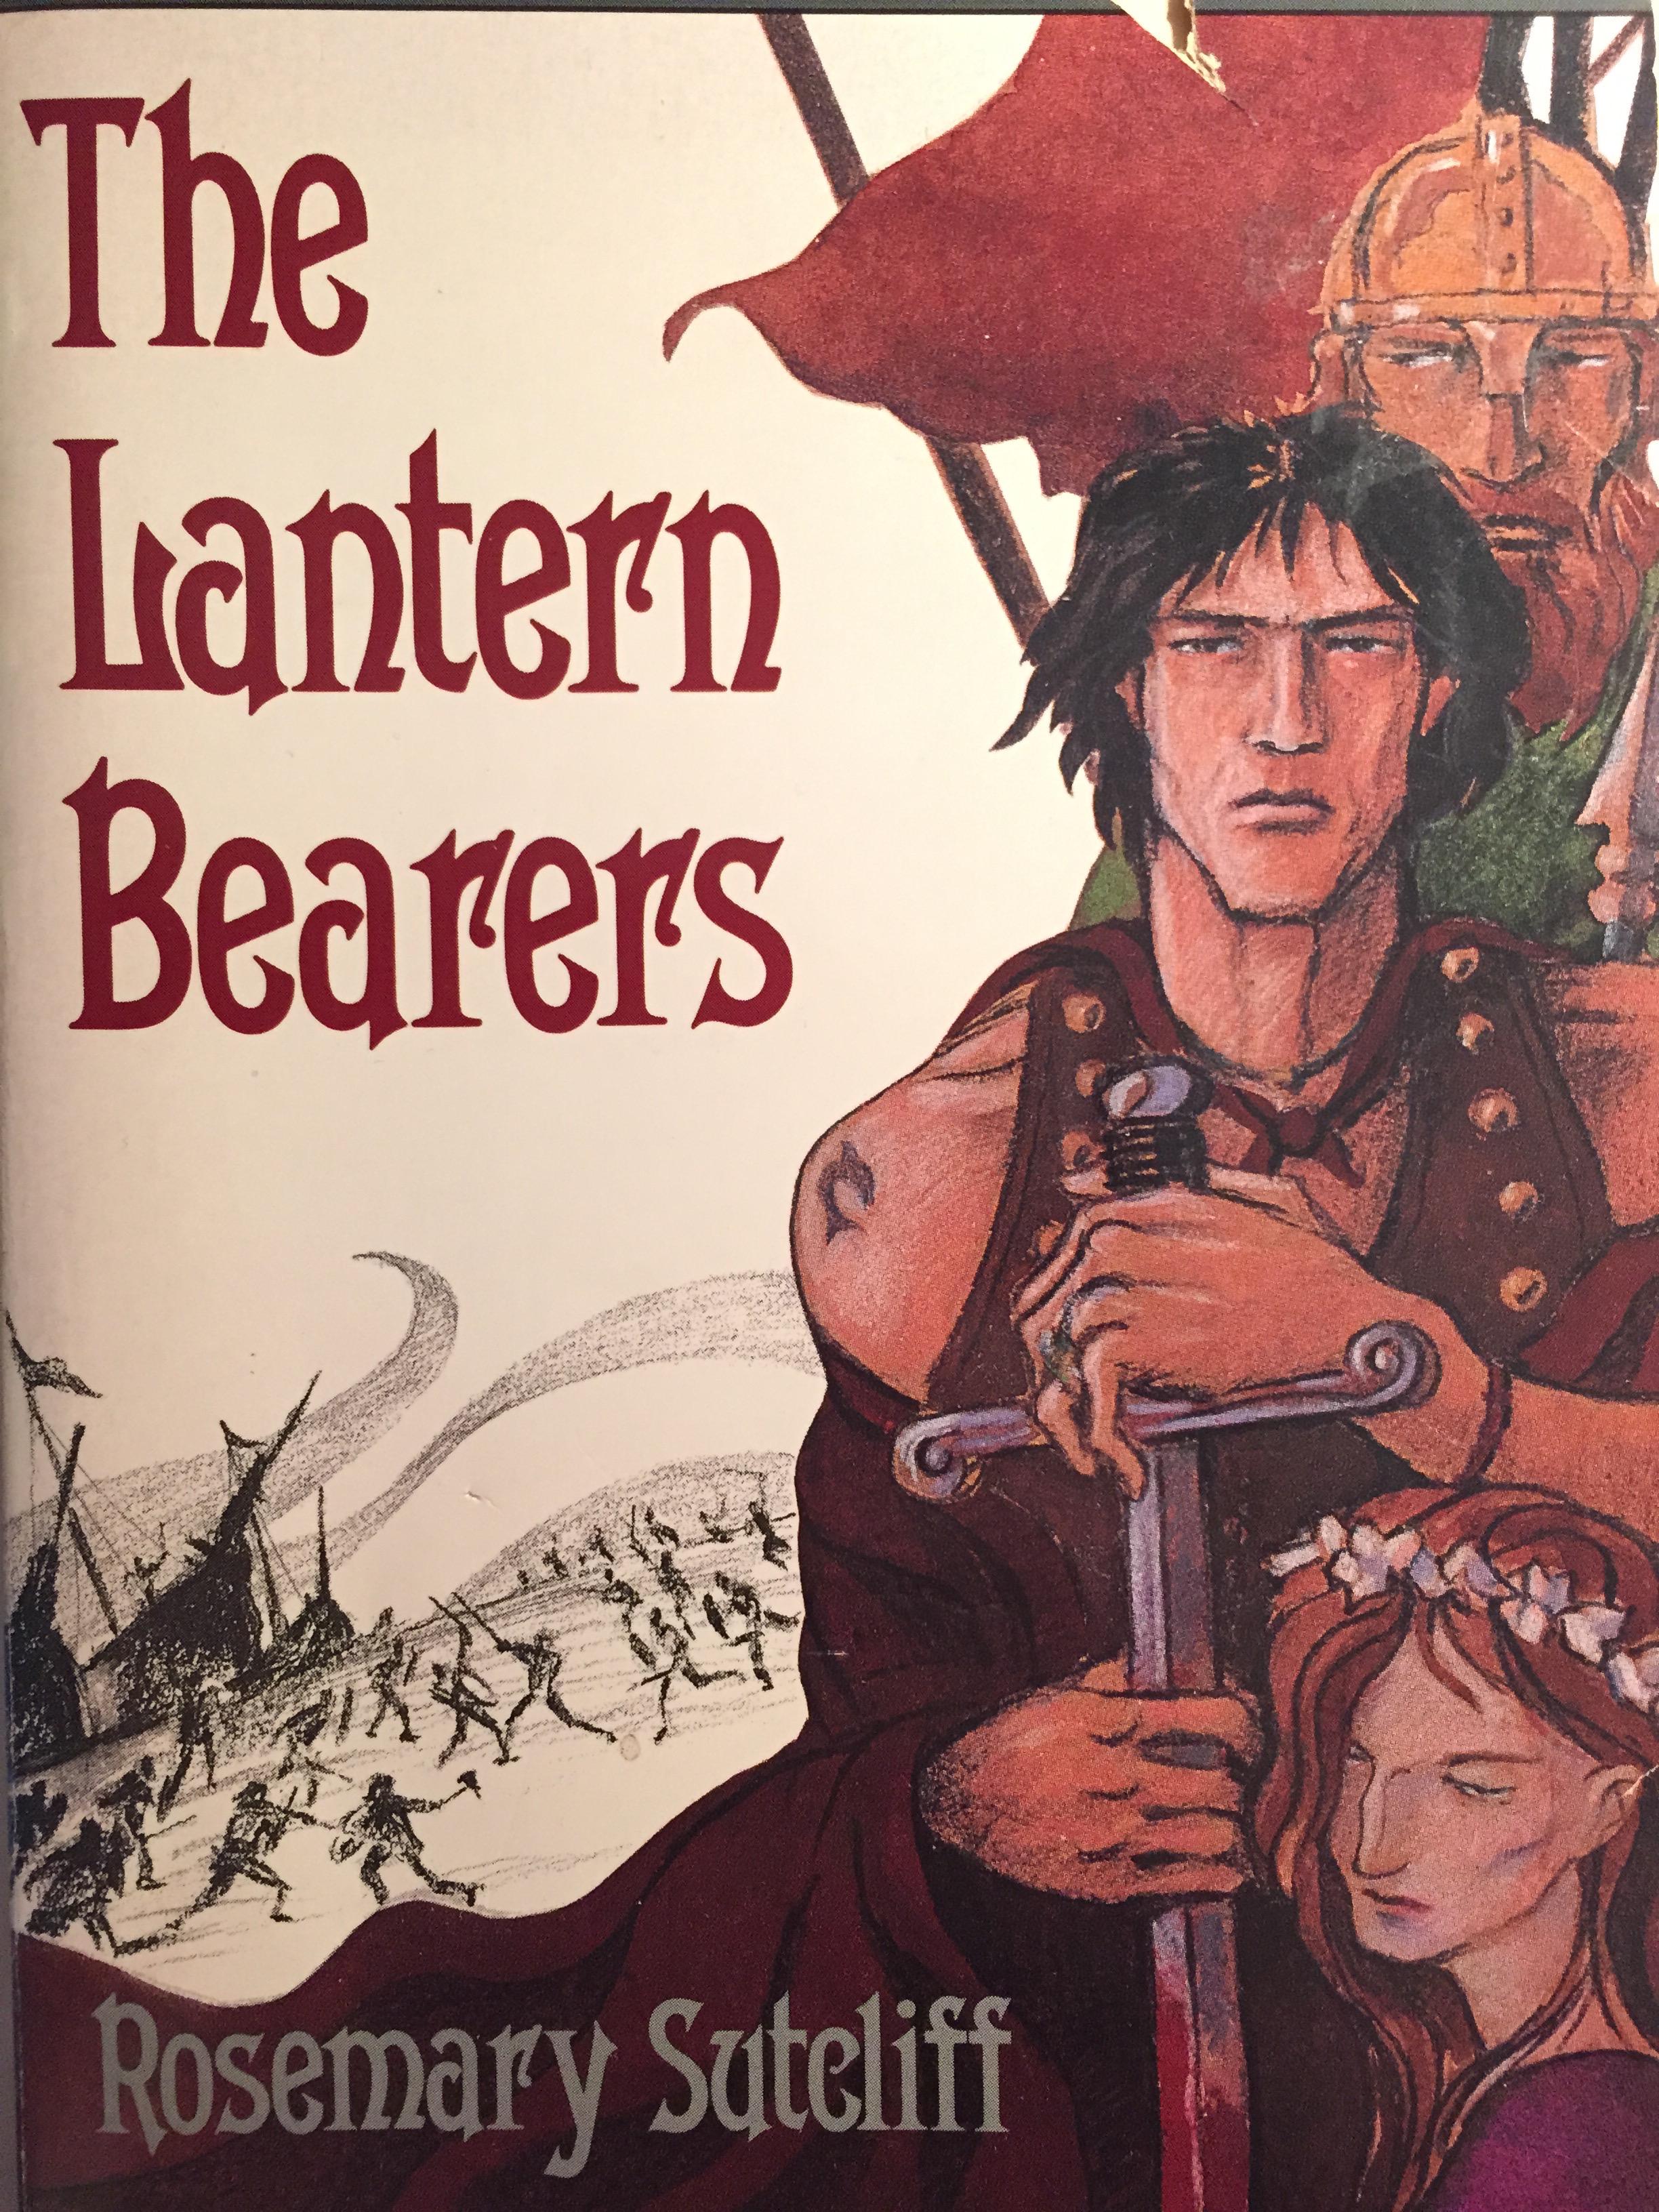 LanternBearers